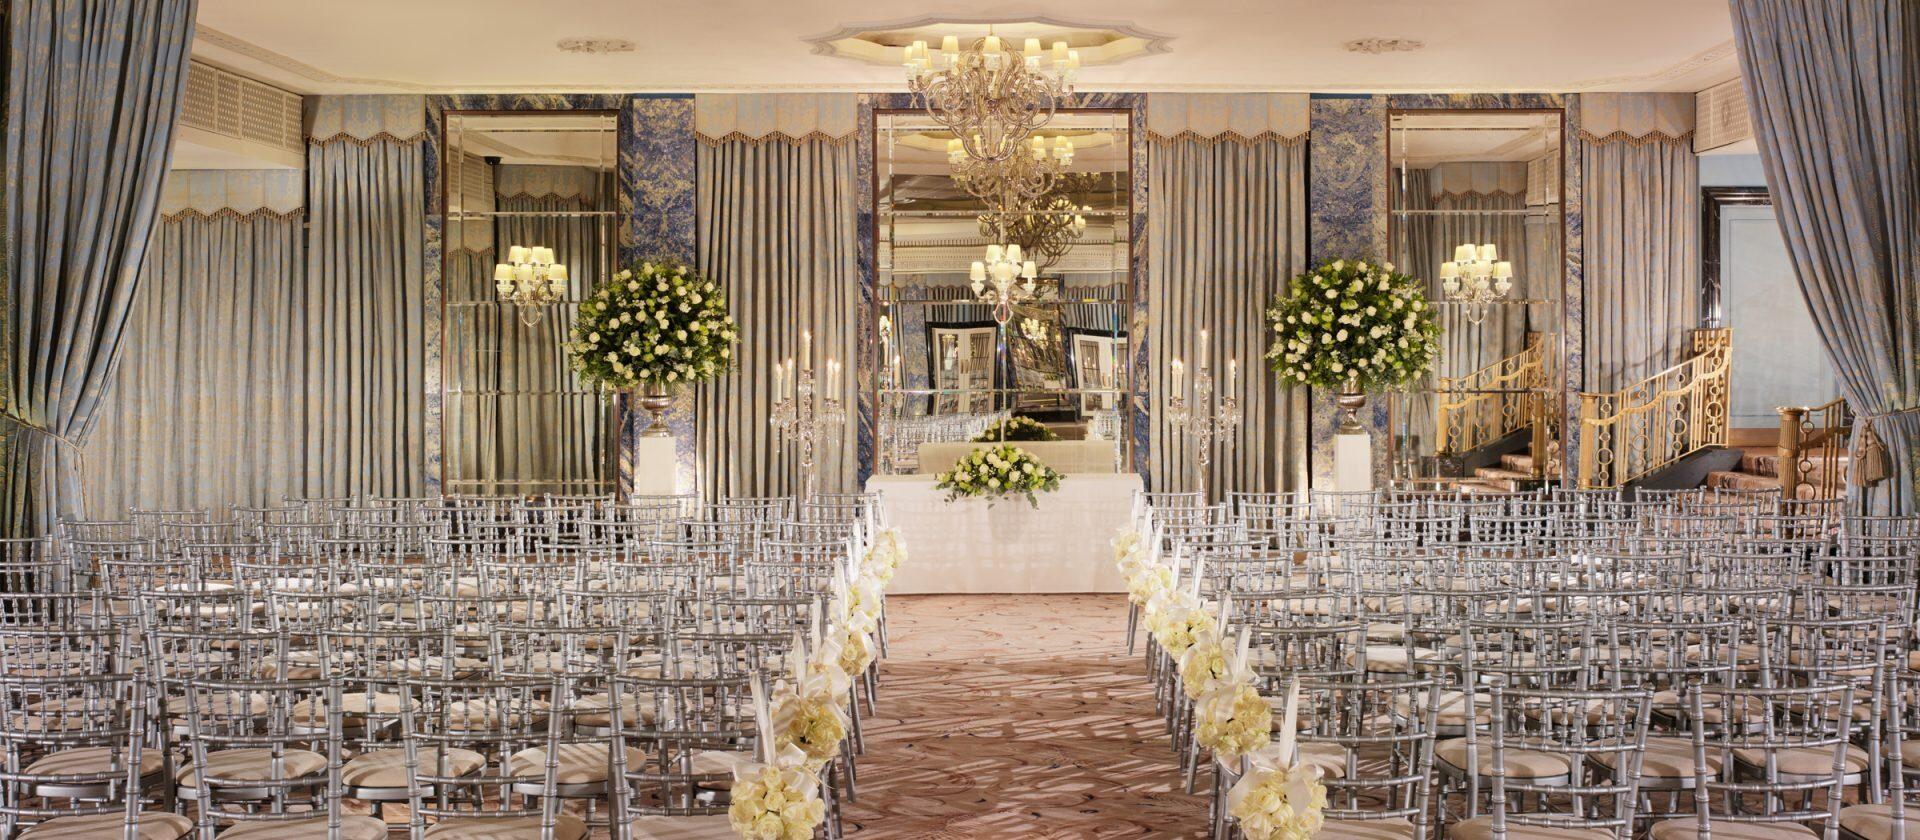 Luxury Wedding Venues: 5-Star Luxury Wedding Venues